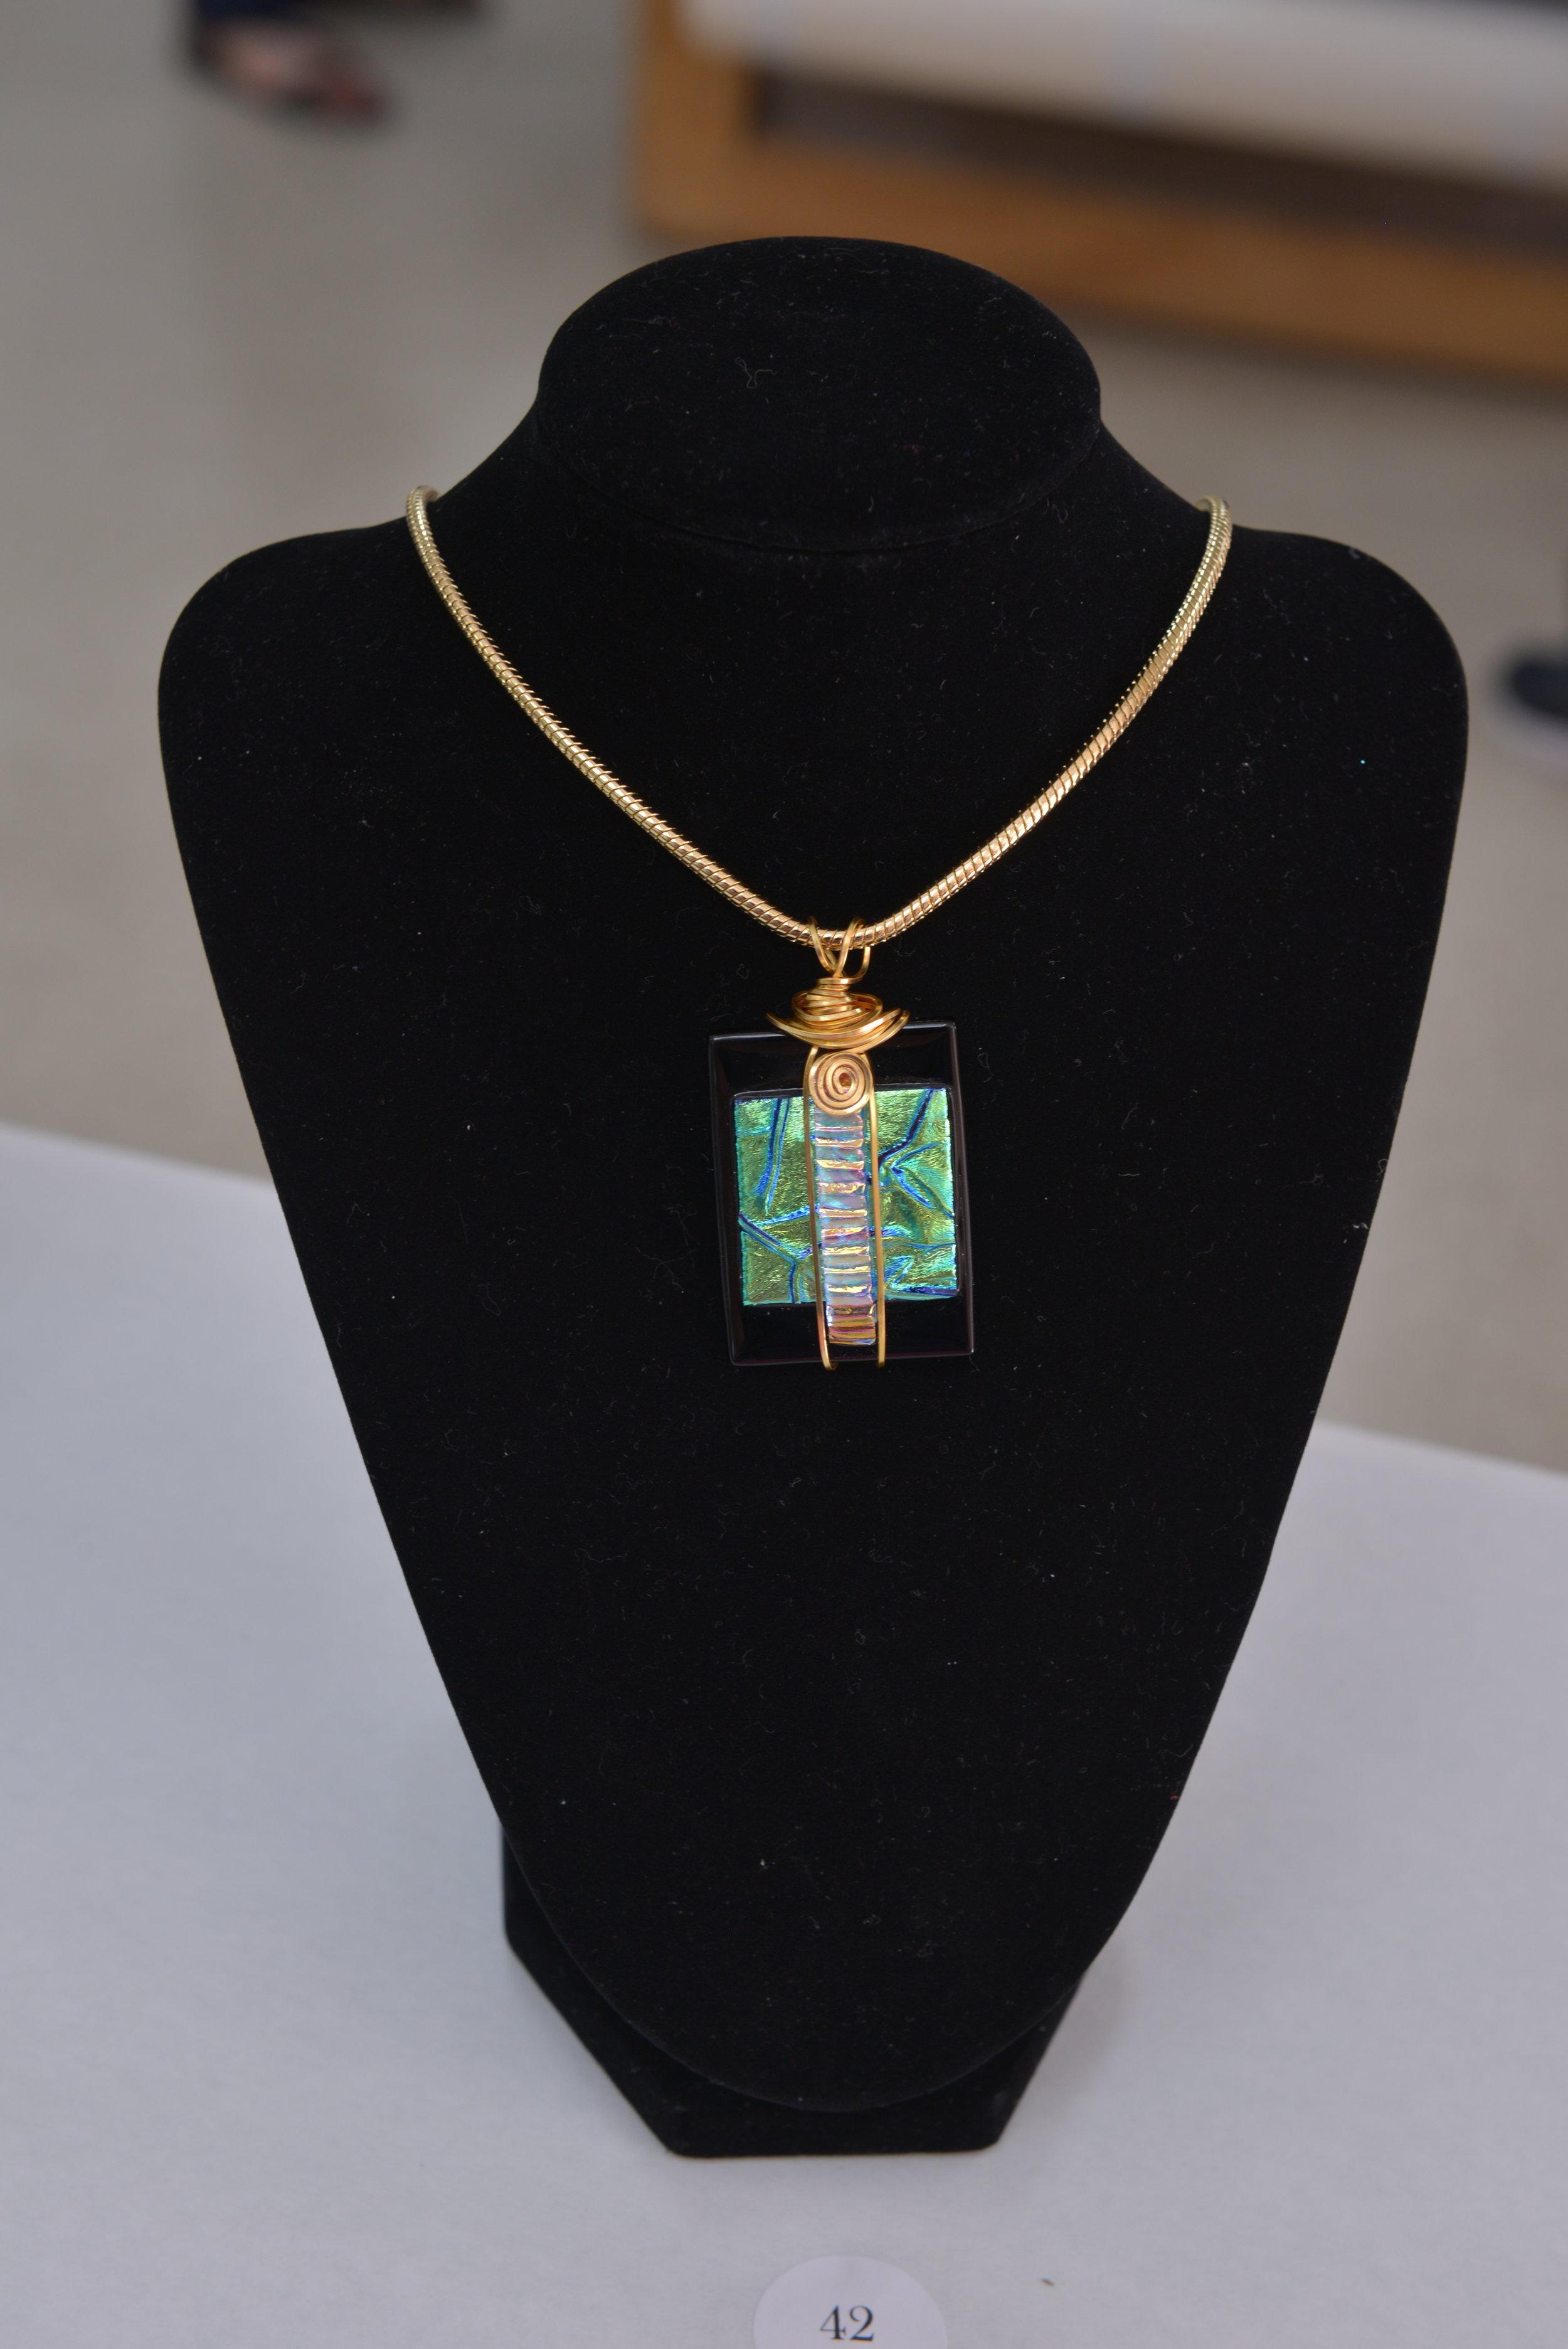 Glass Jewelry - 2nd Place